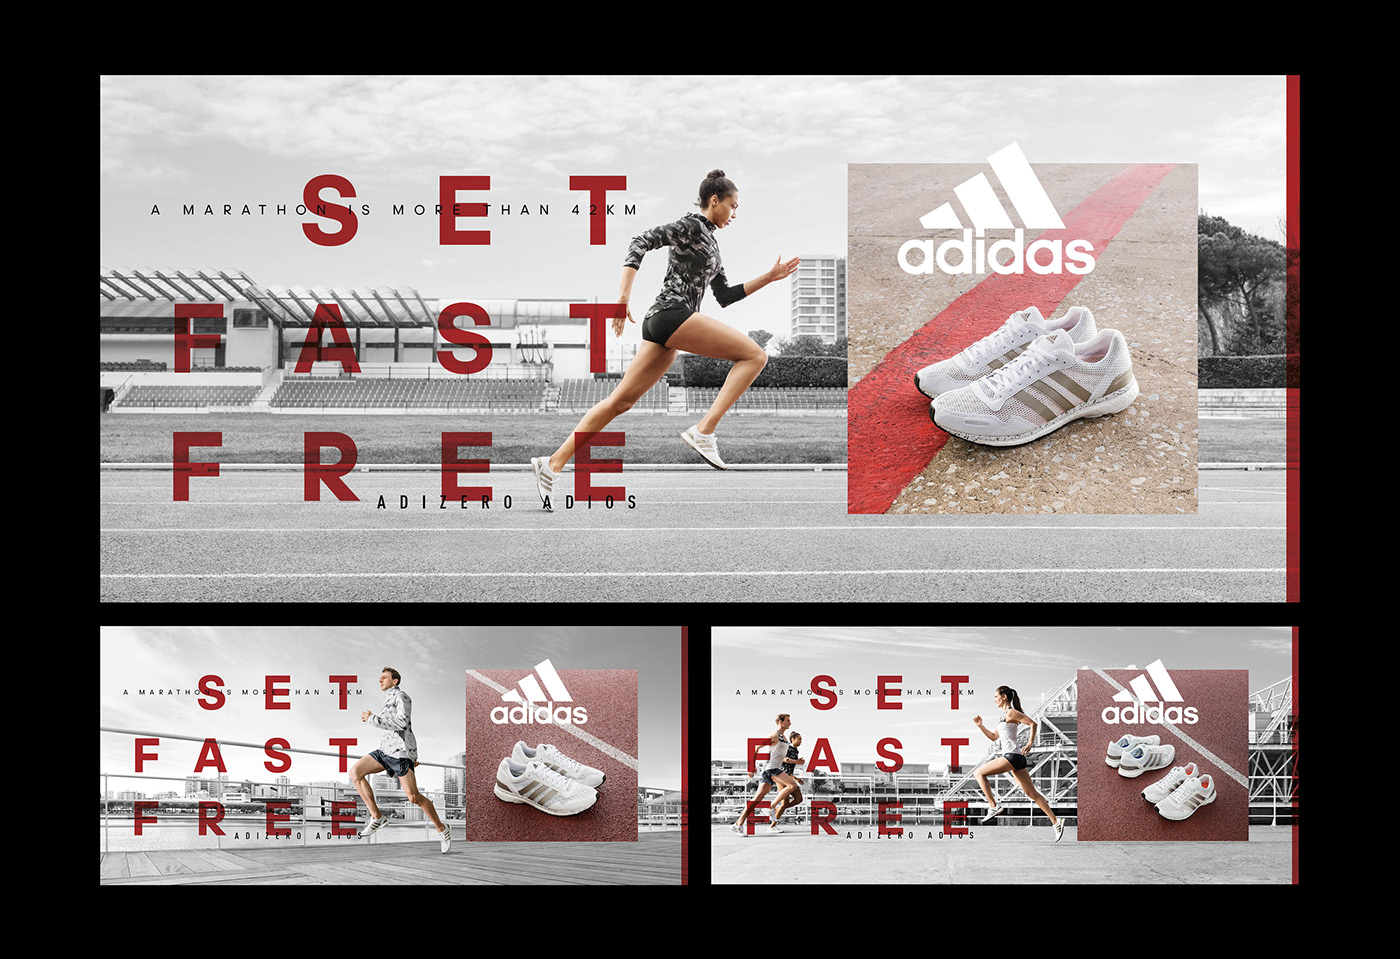 adizero,adidas,adios,running,shoe,runningshoe,Marathon,training,stefano dessi,heimat active